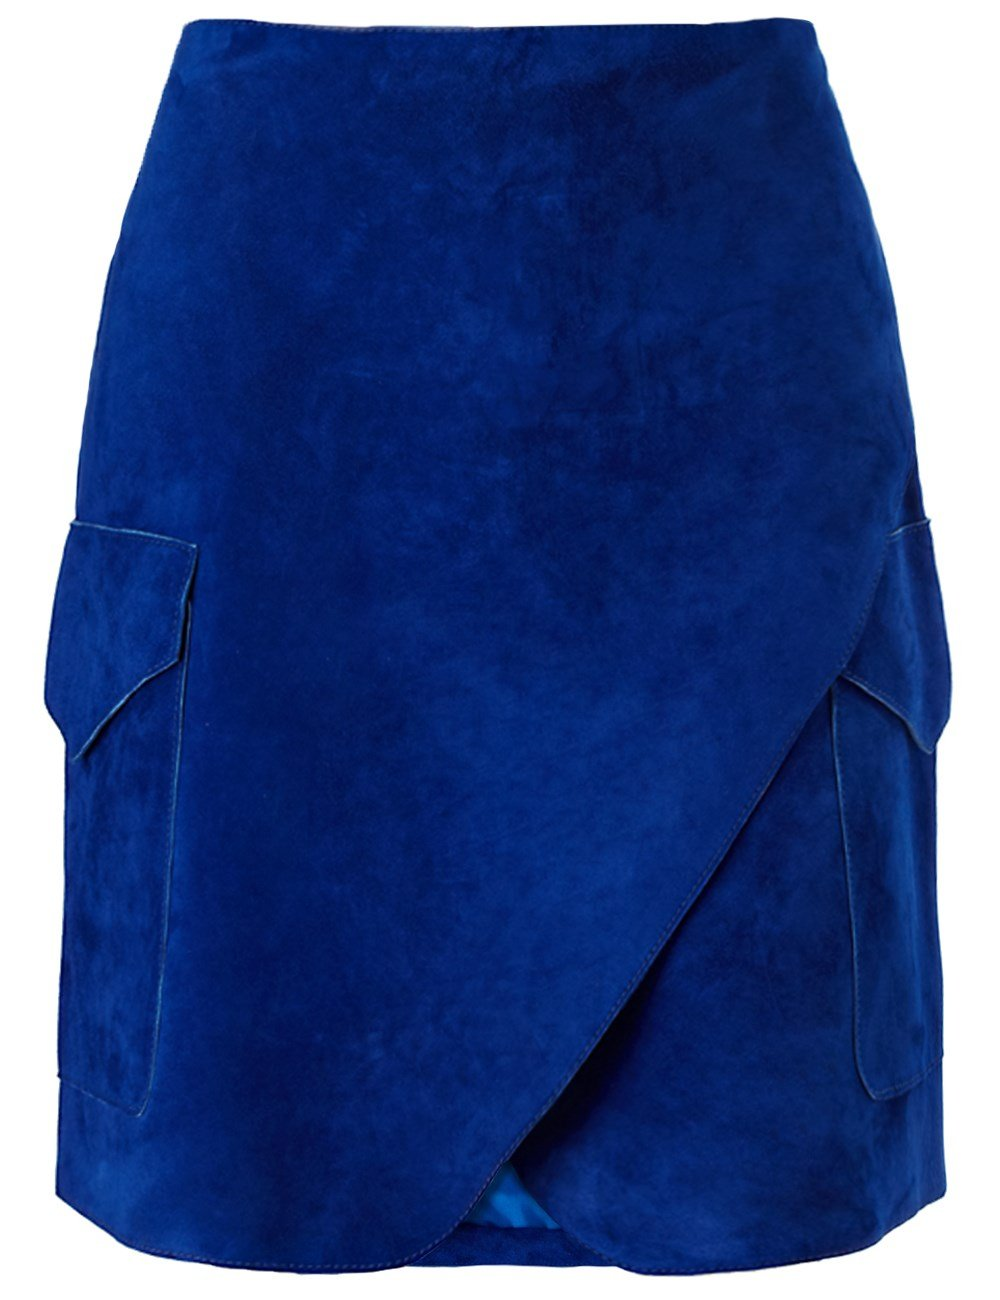 derek lam cobalt suede wrap skirt in blue lyst